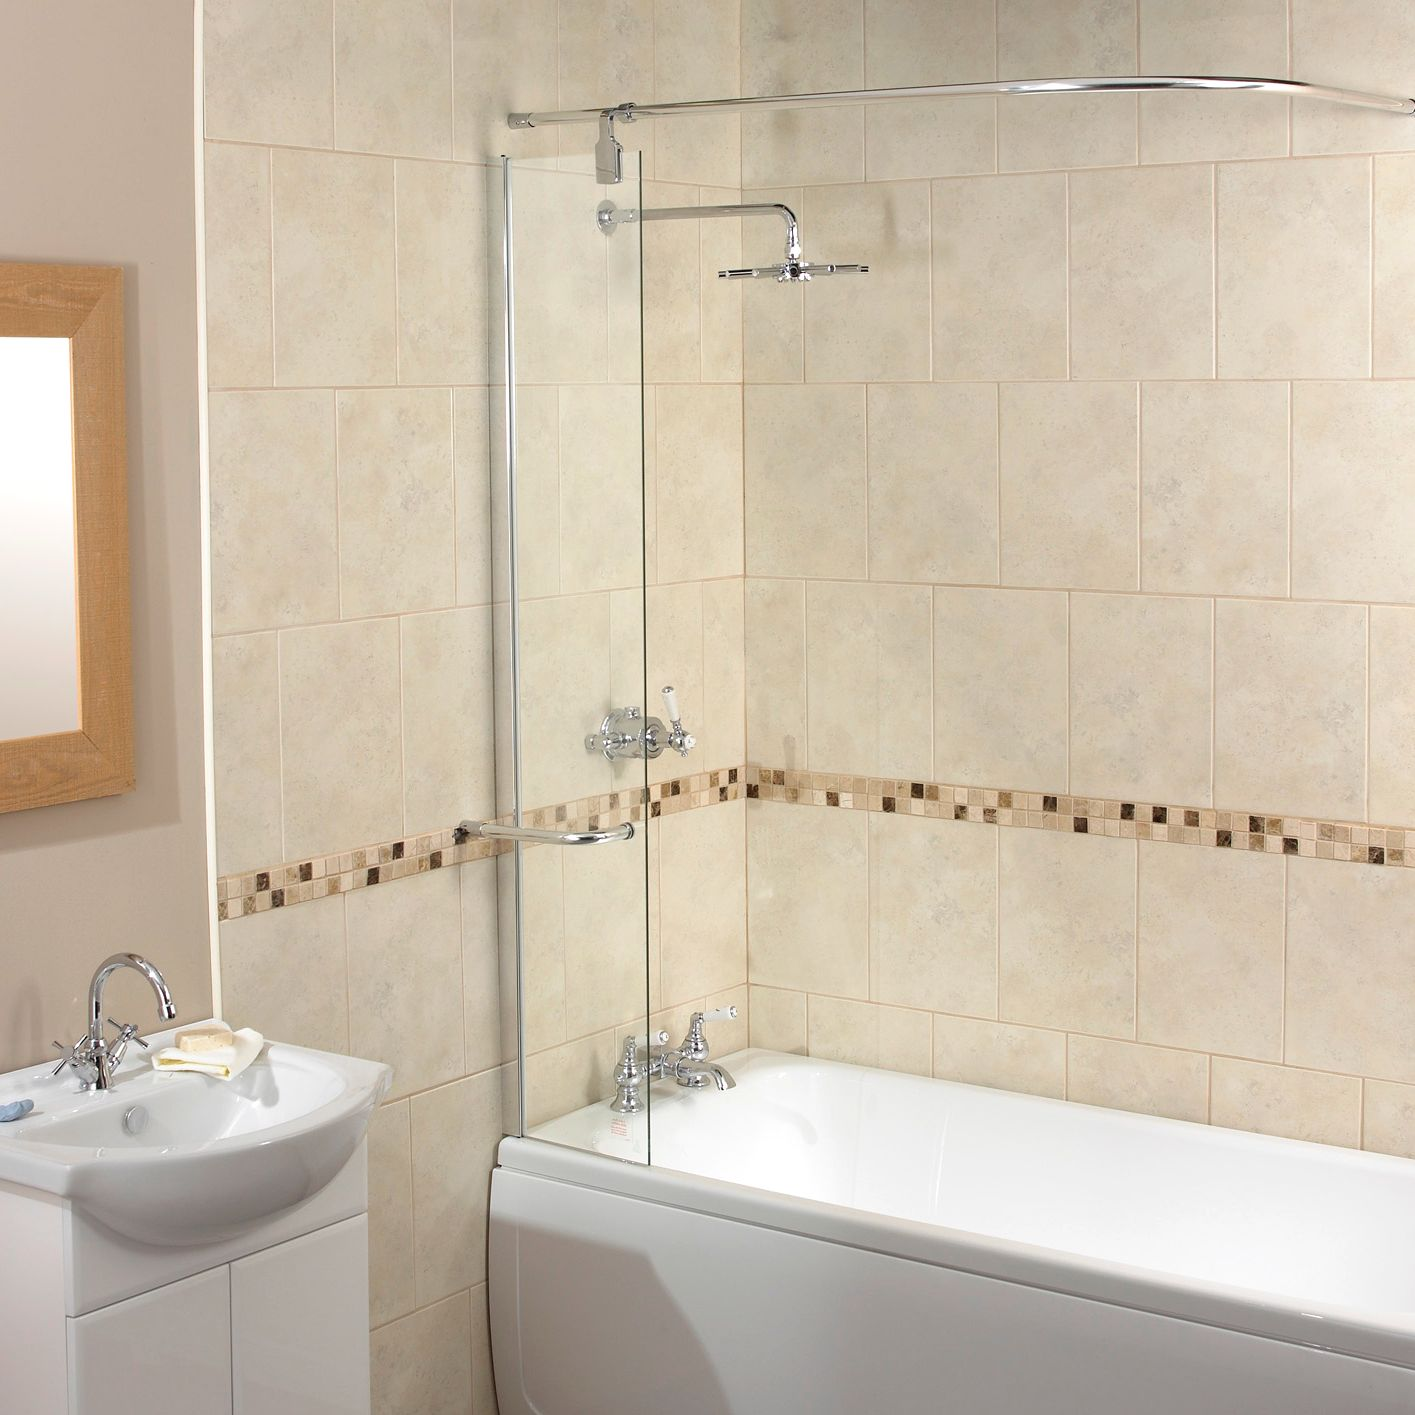 John Lewis Splash Guard Shower Screen With Rail Review